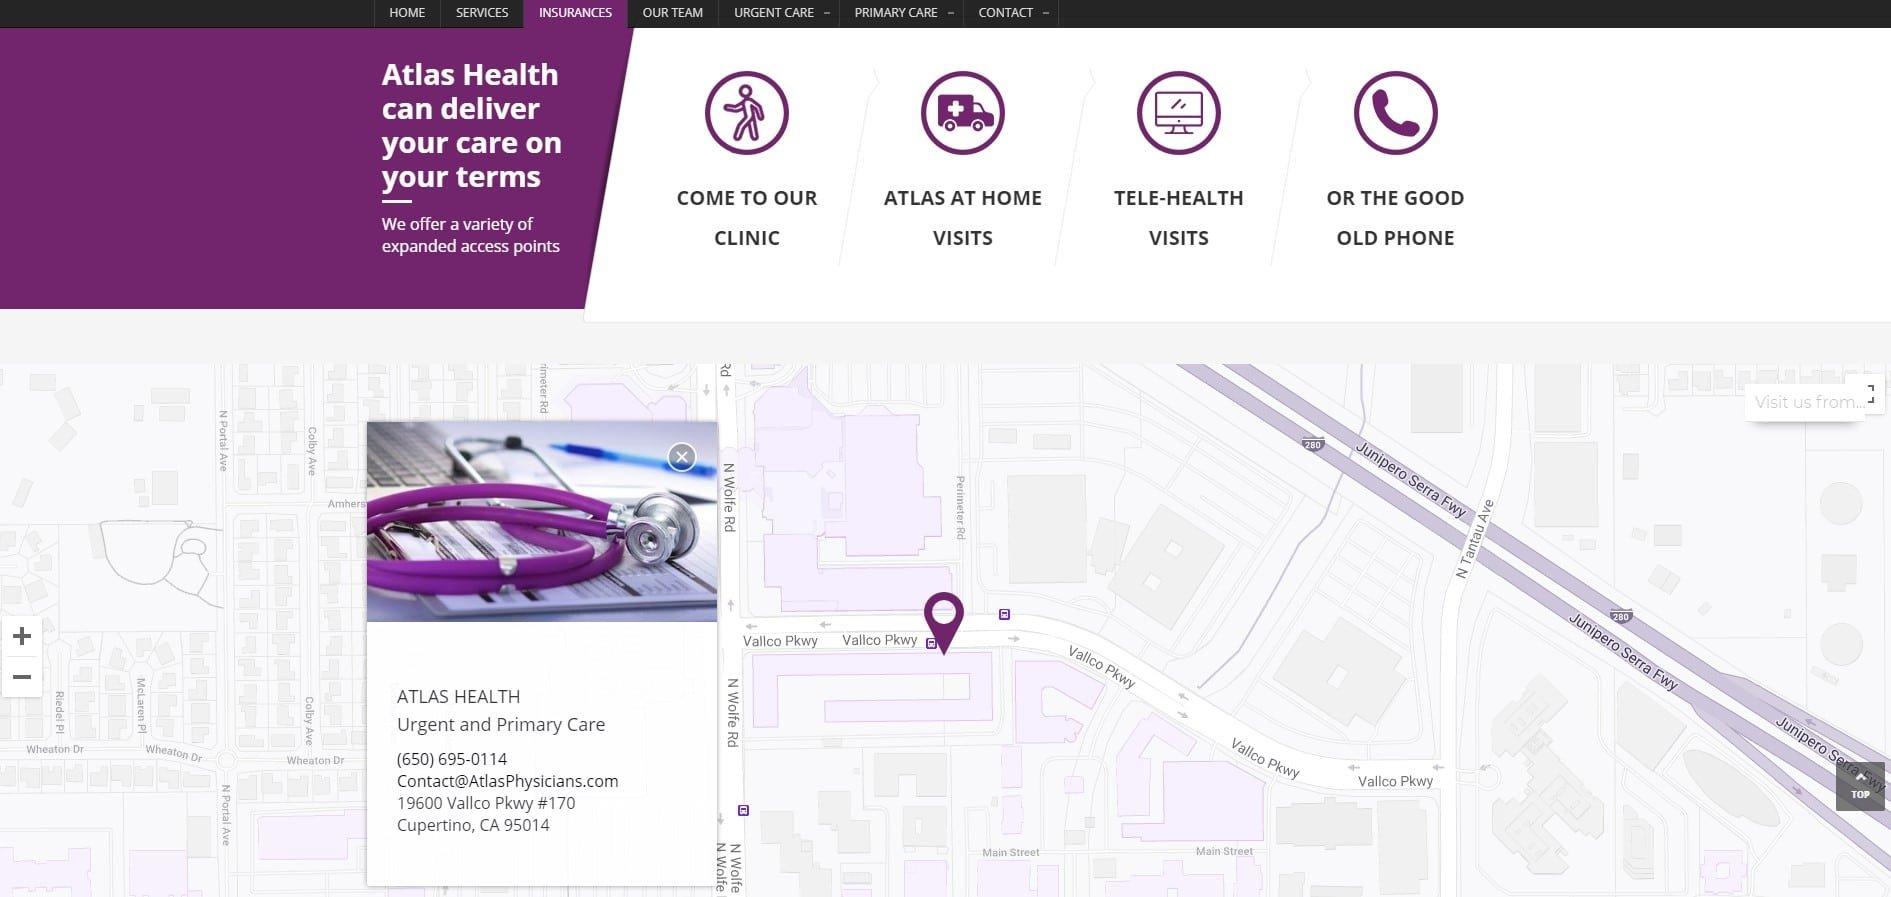 bigPromoter health-2 Atlas Health